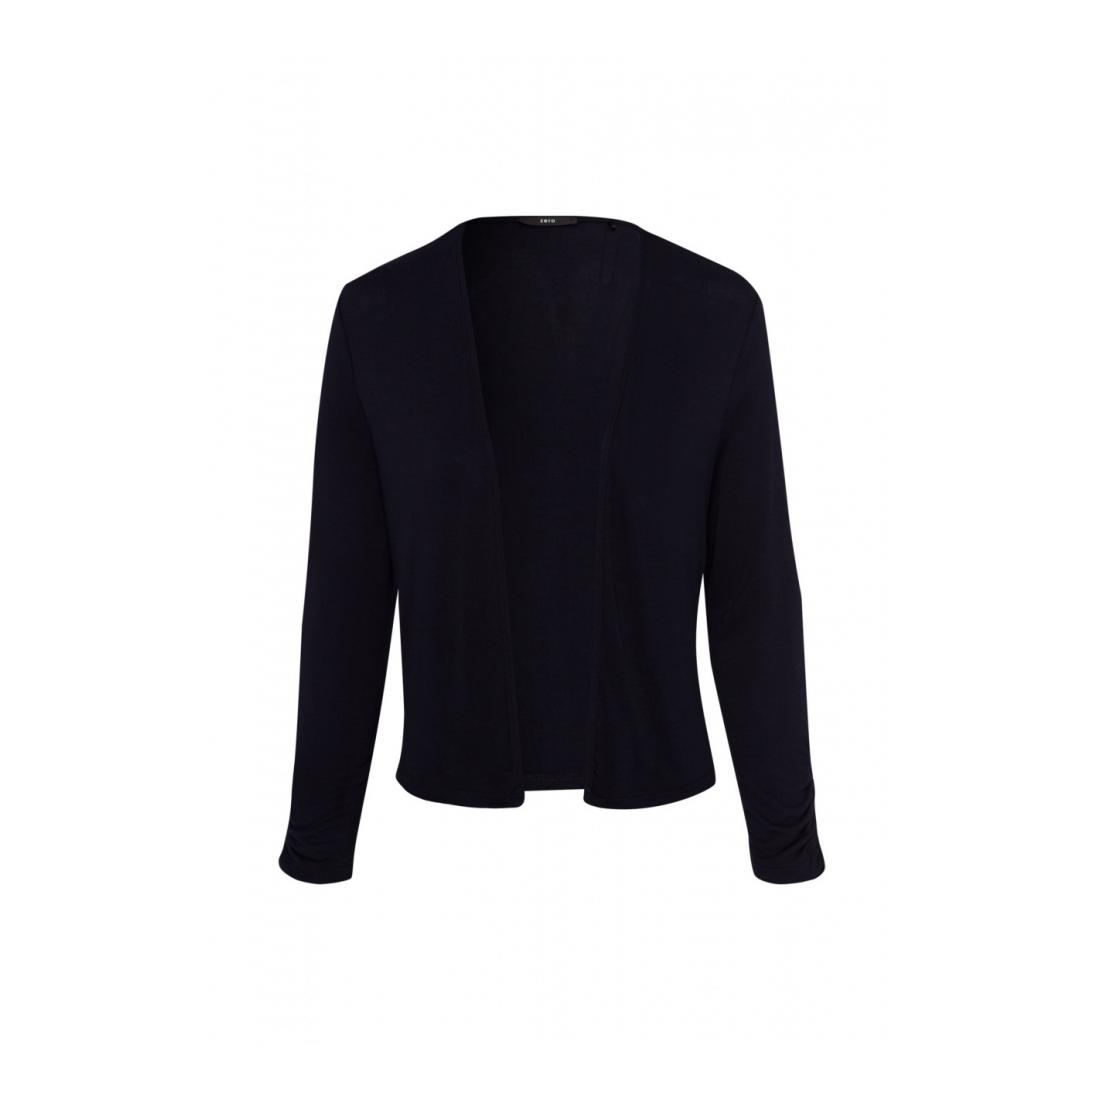 Zero Hoodie Jersey Sweater